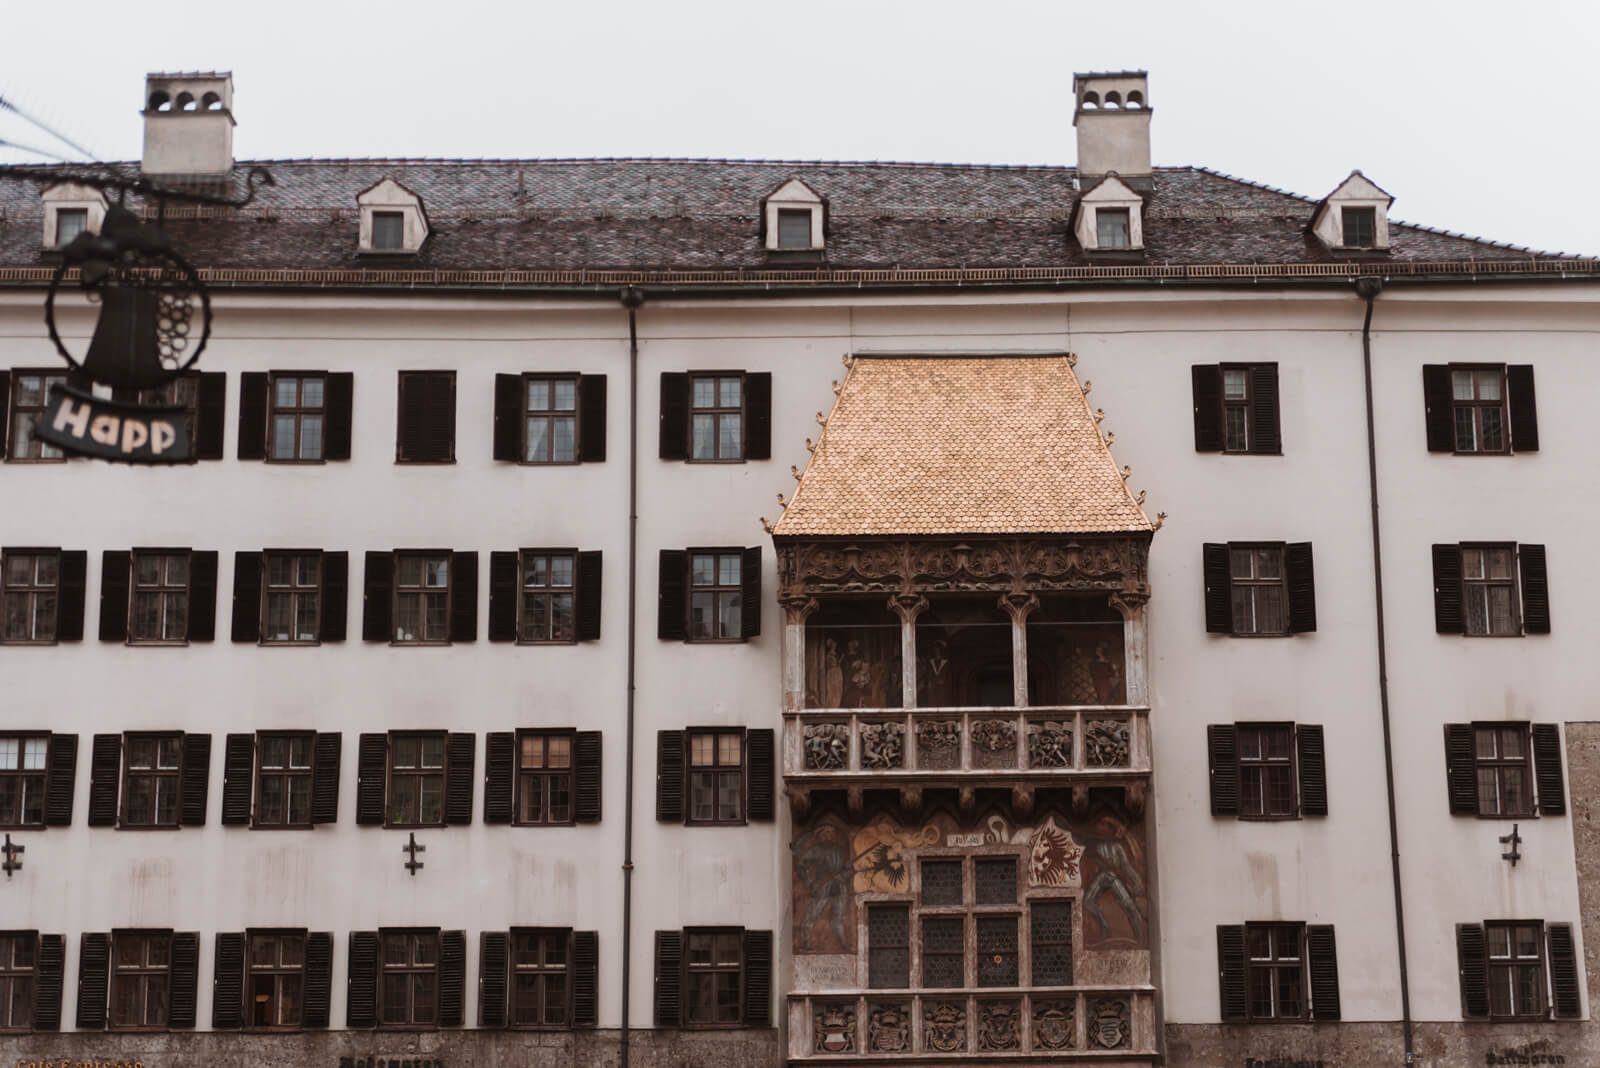 Innsbruck-austria-lavienblog-allrightsreserved6